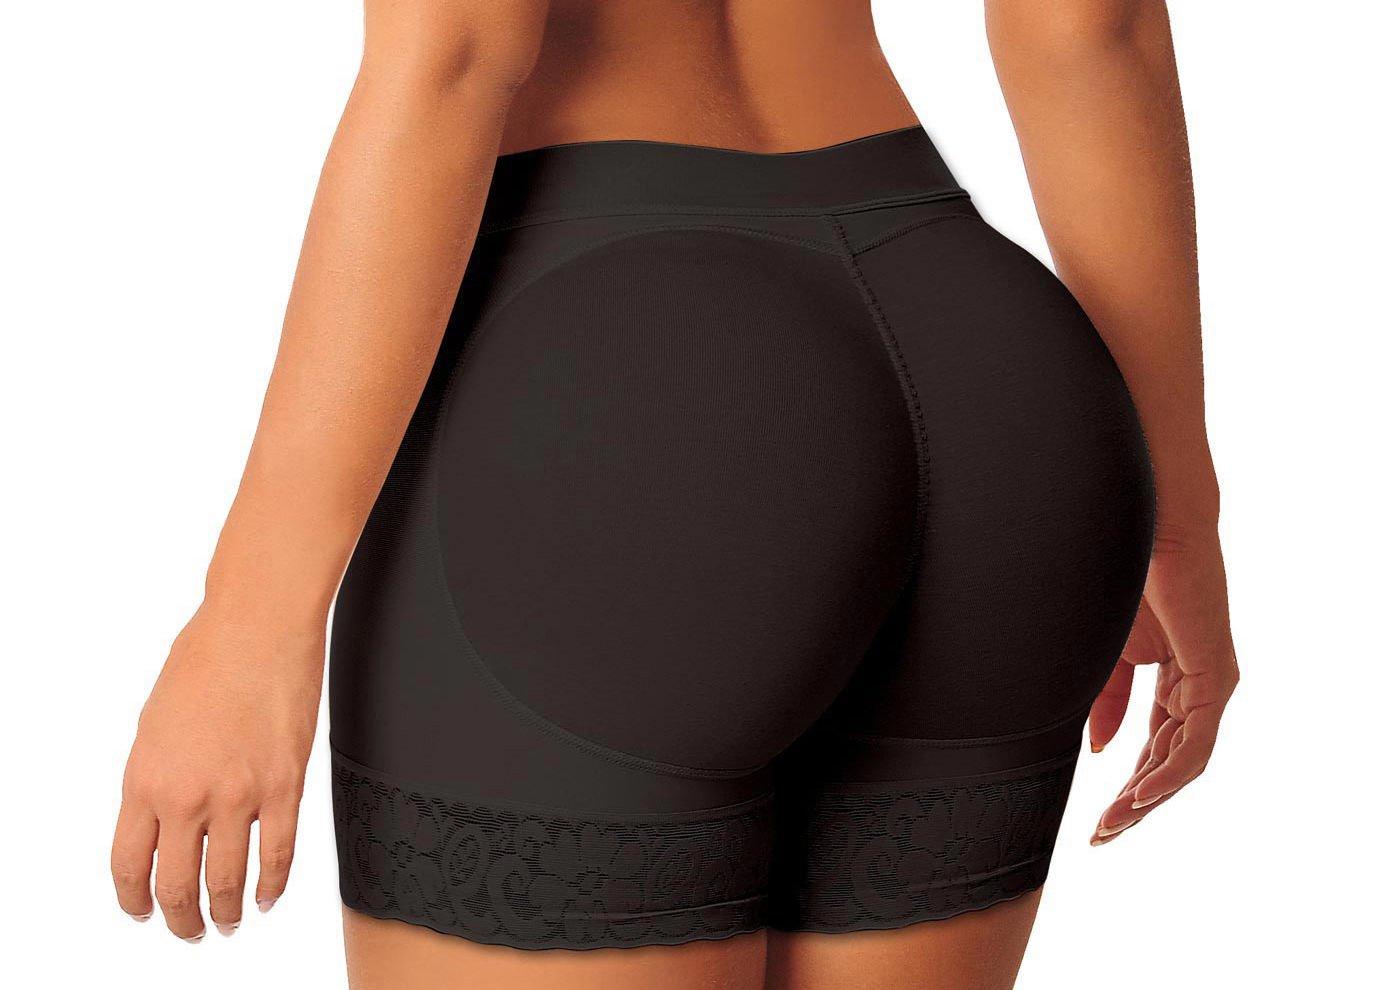 S-XXL Size Black Color Hot Sale Butt Lifter With Floral Lace Trim W35063B